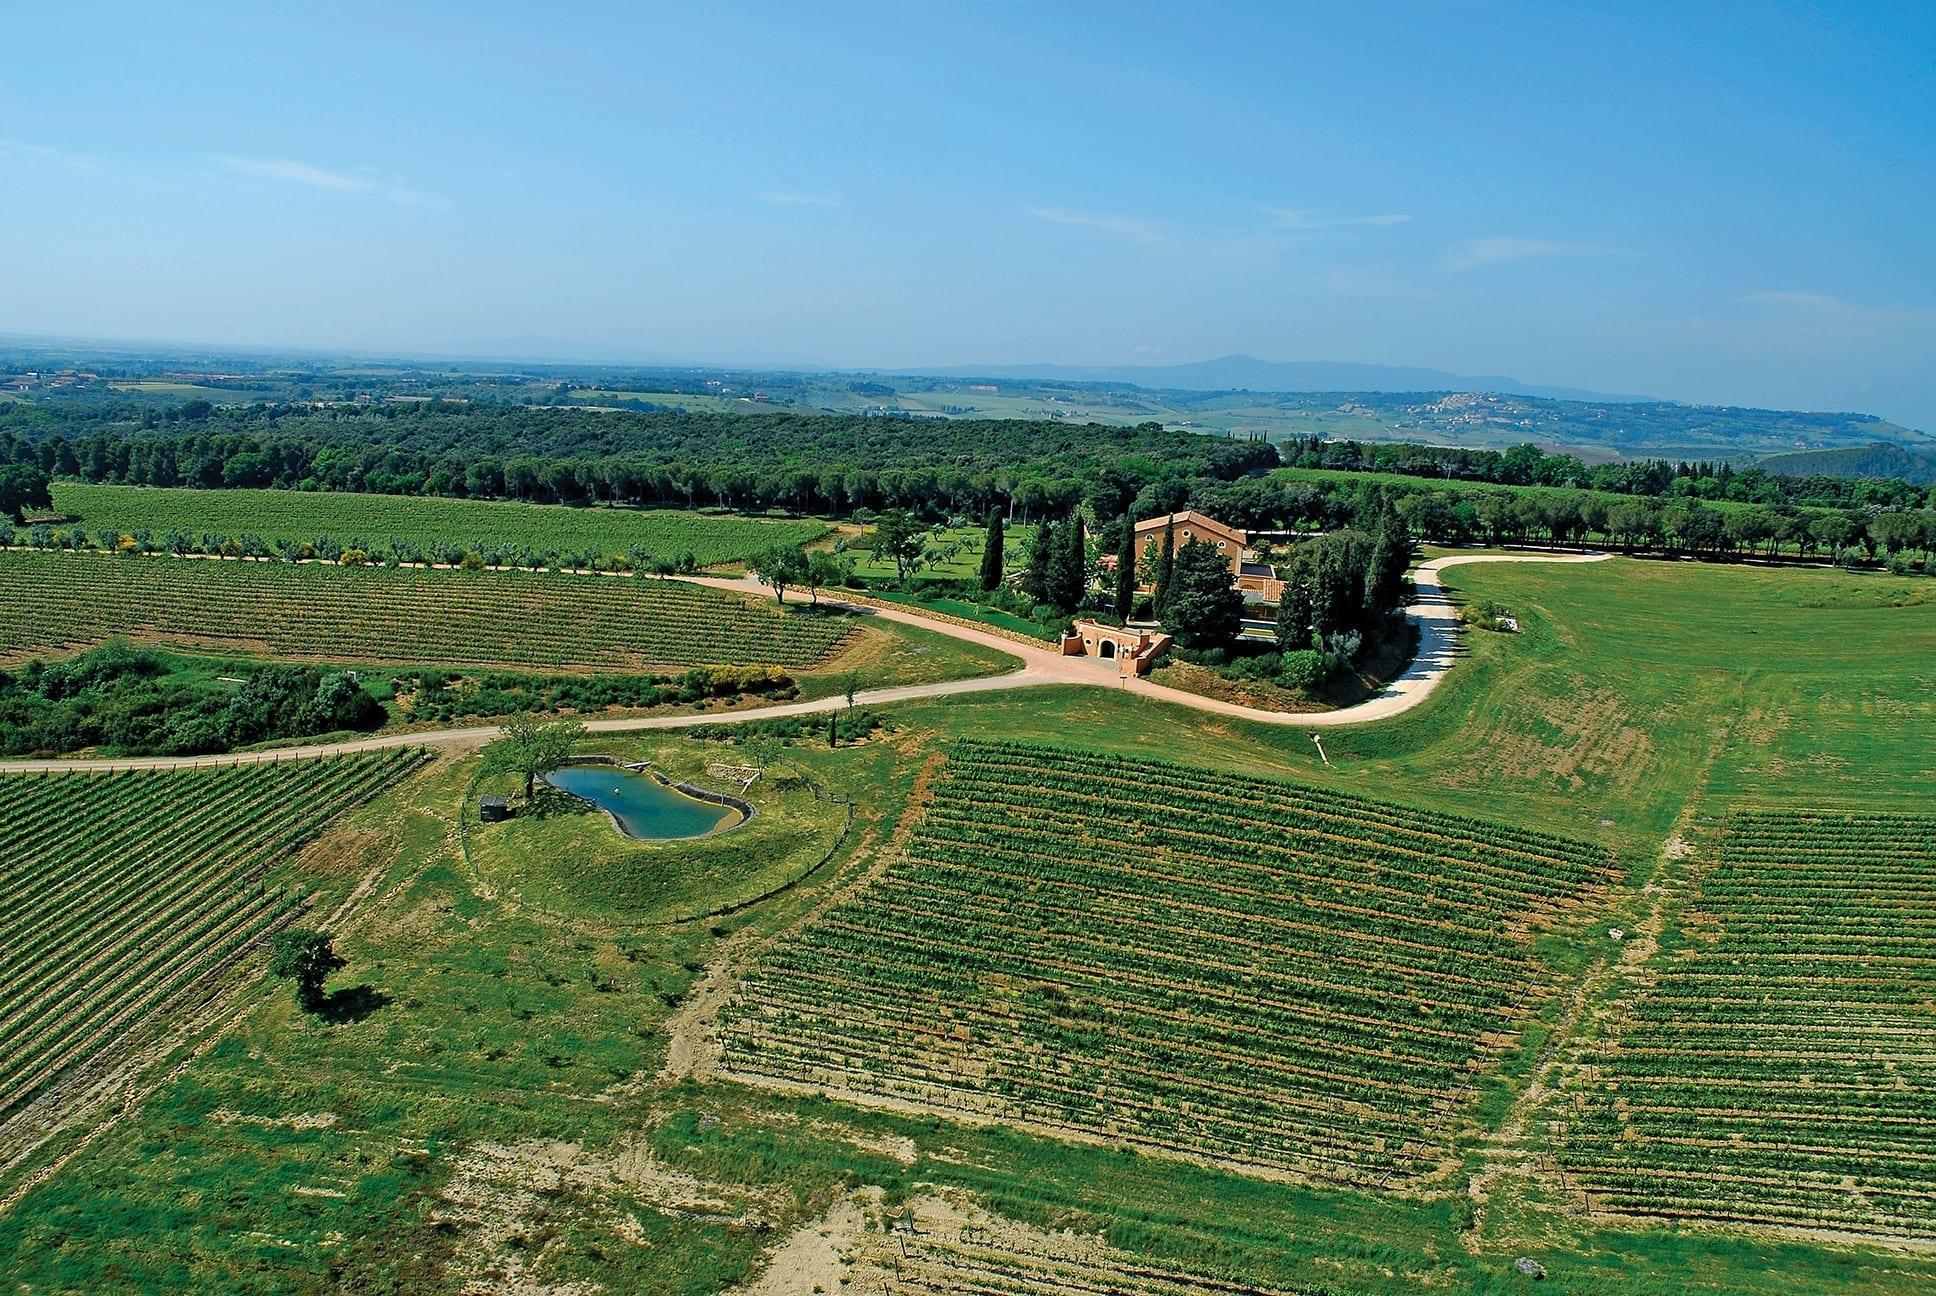 Tenuta di Biserno, Maremma, Italy, winery, Tuscany